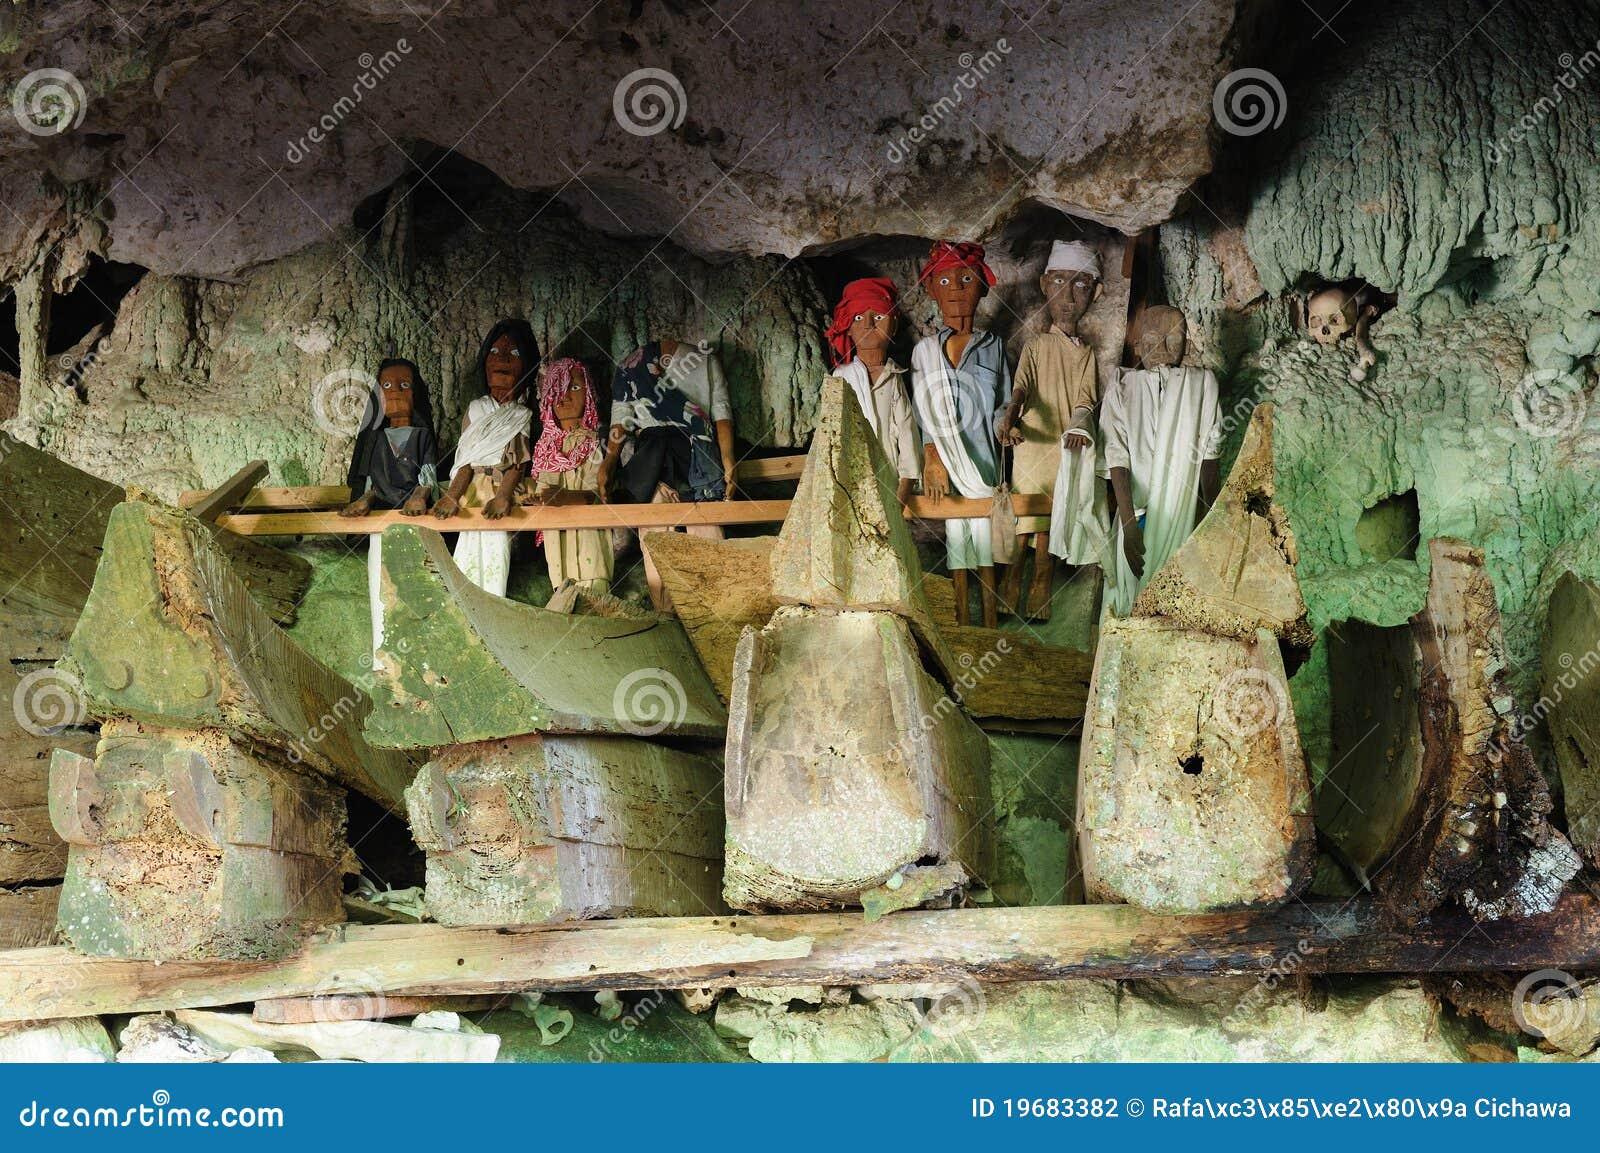 L Indonésie, Sulawesi, Tana Toraja, tombeau antique